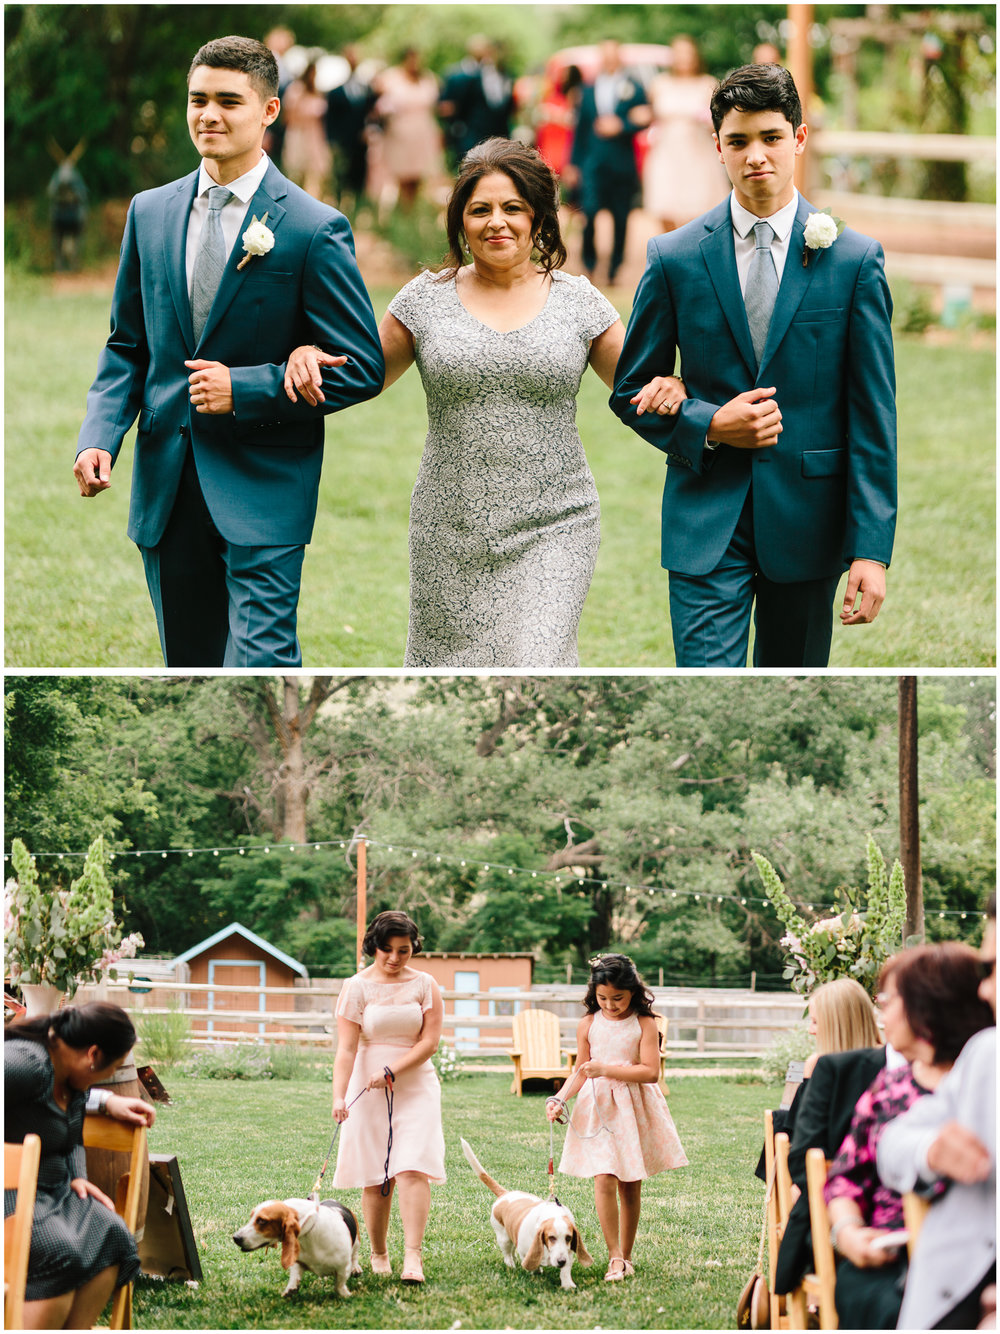 lyons_farmette_wedding_20.jpg